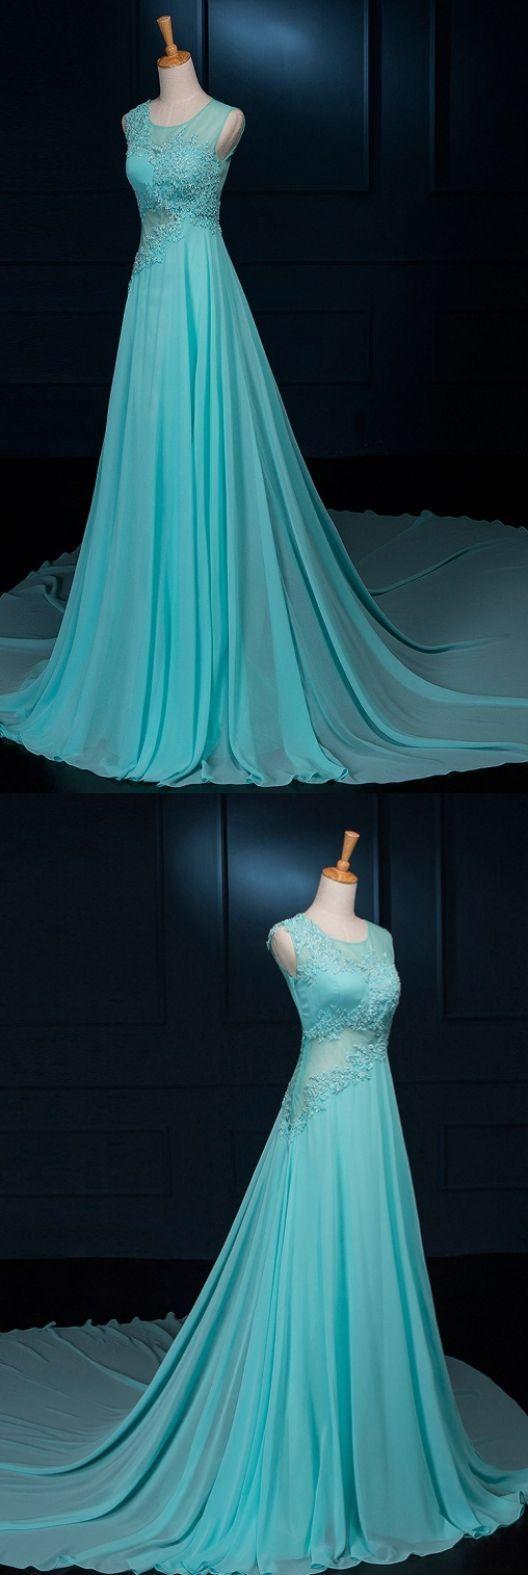 Beadedbeading prom dresses light blue alineprincess prom dresses